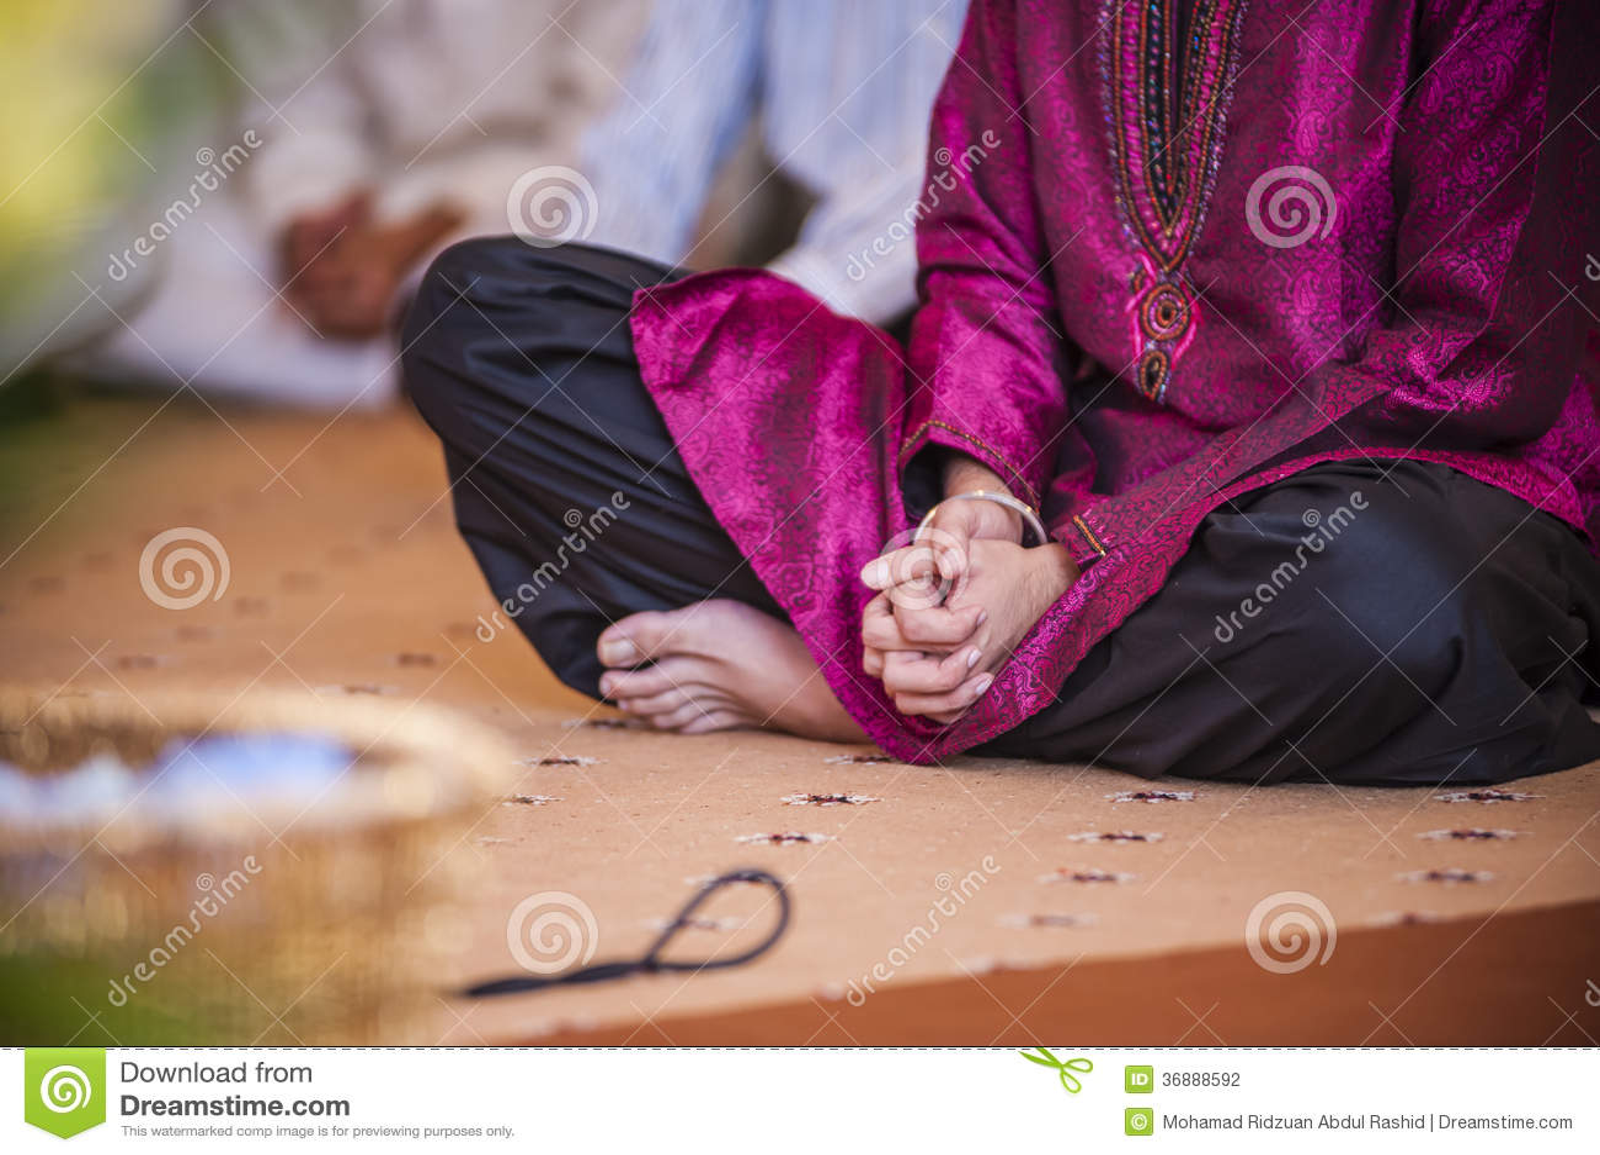 Download Afferrare mano fotografia stock. Immagine di seduta, punjabi - 36888592